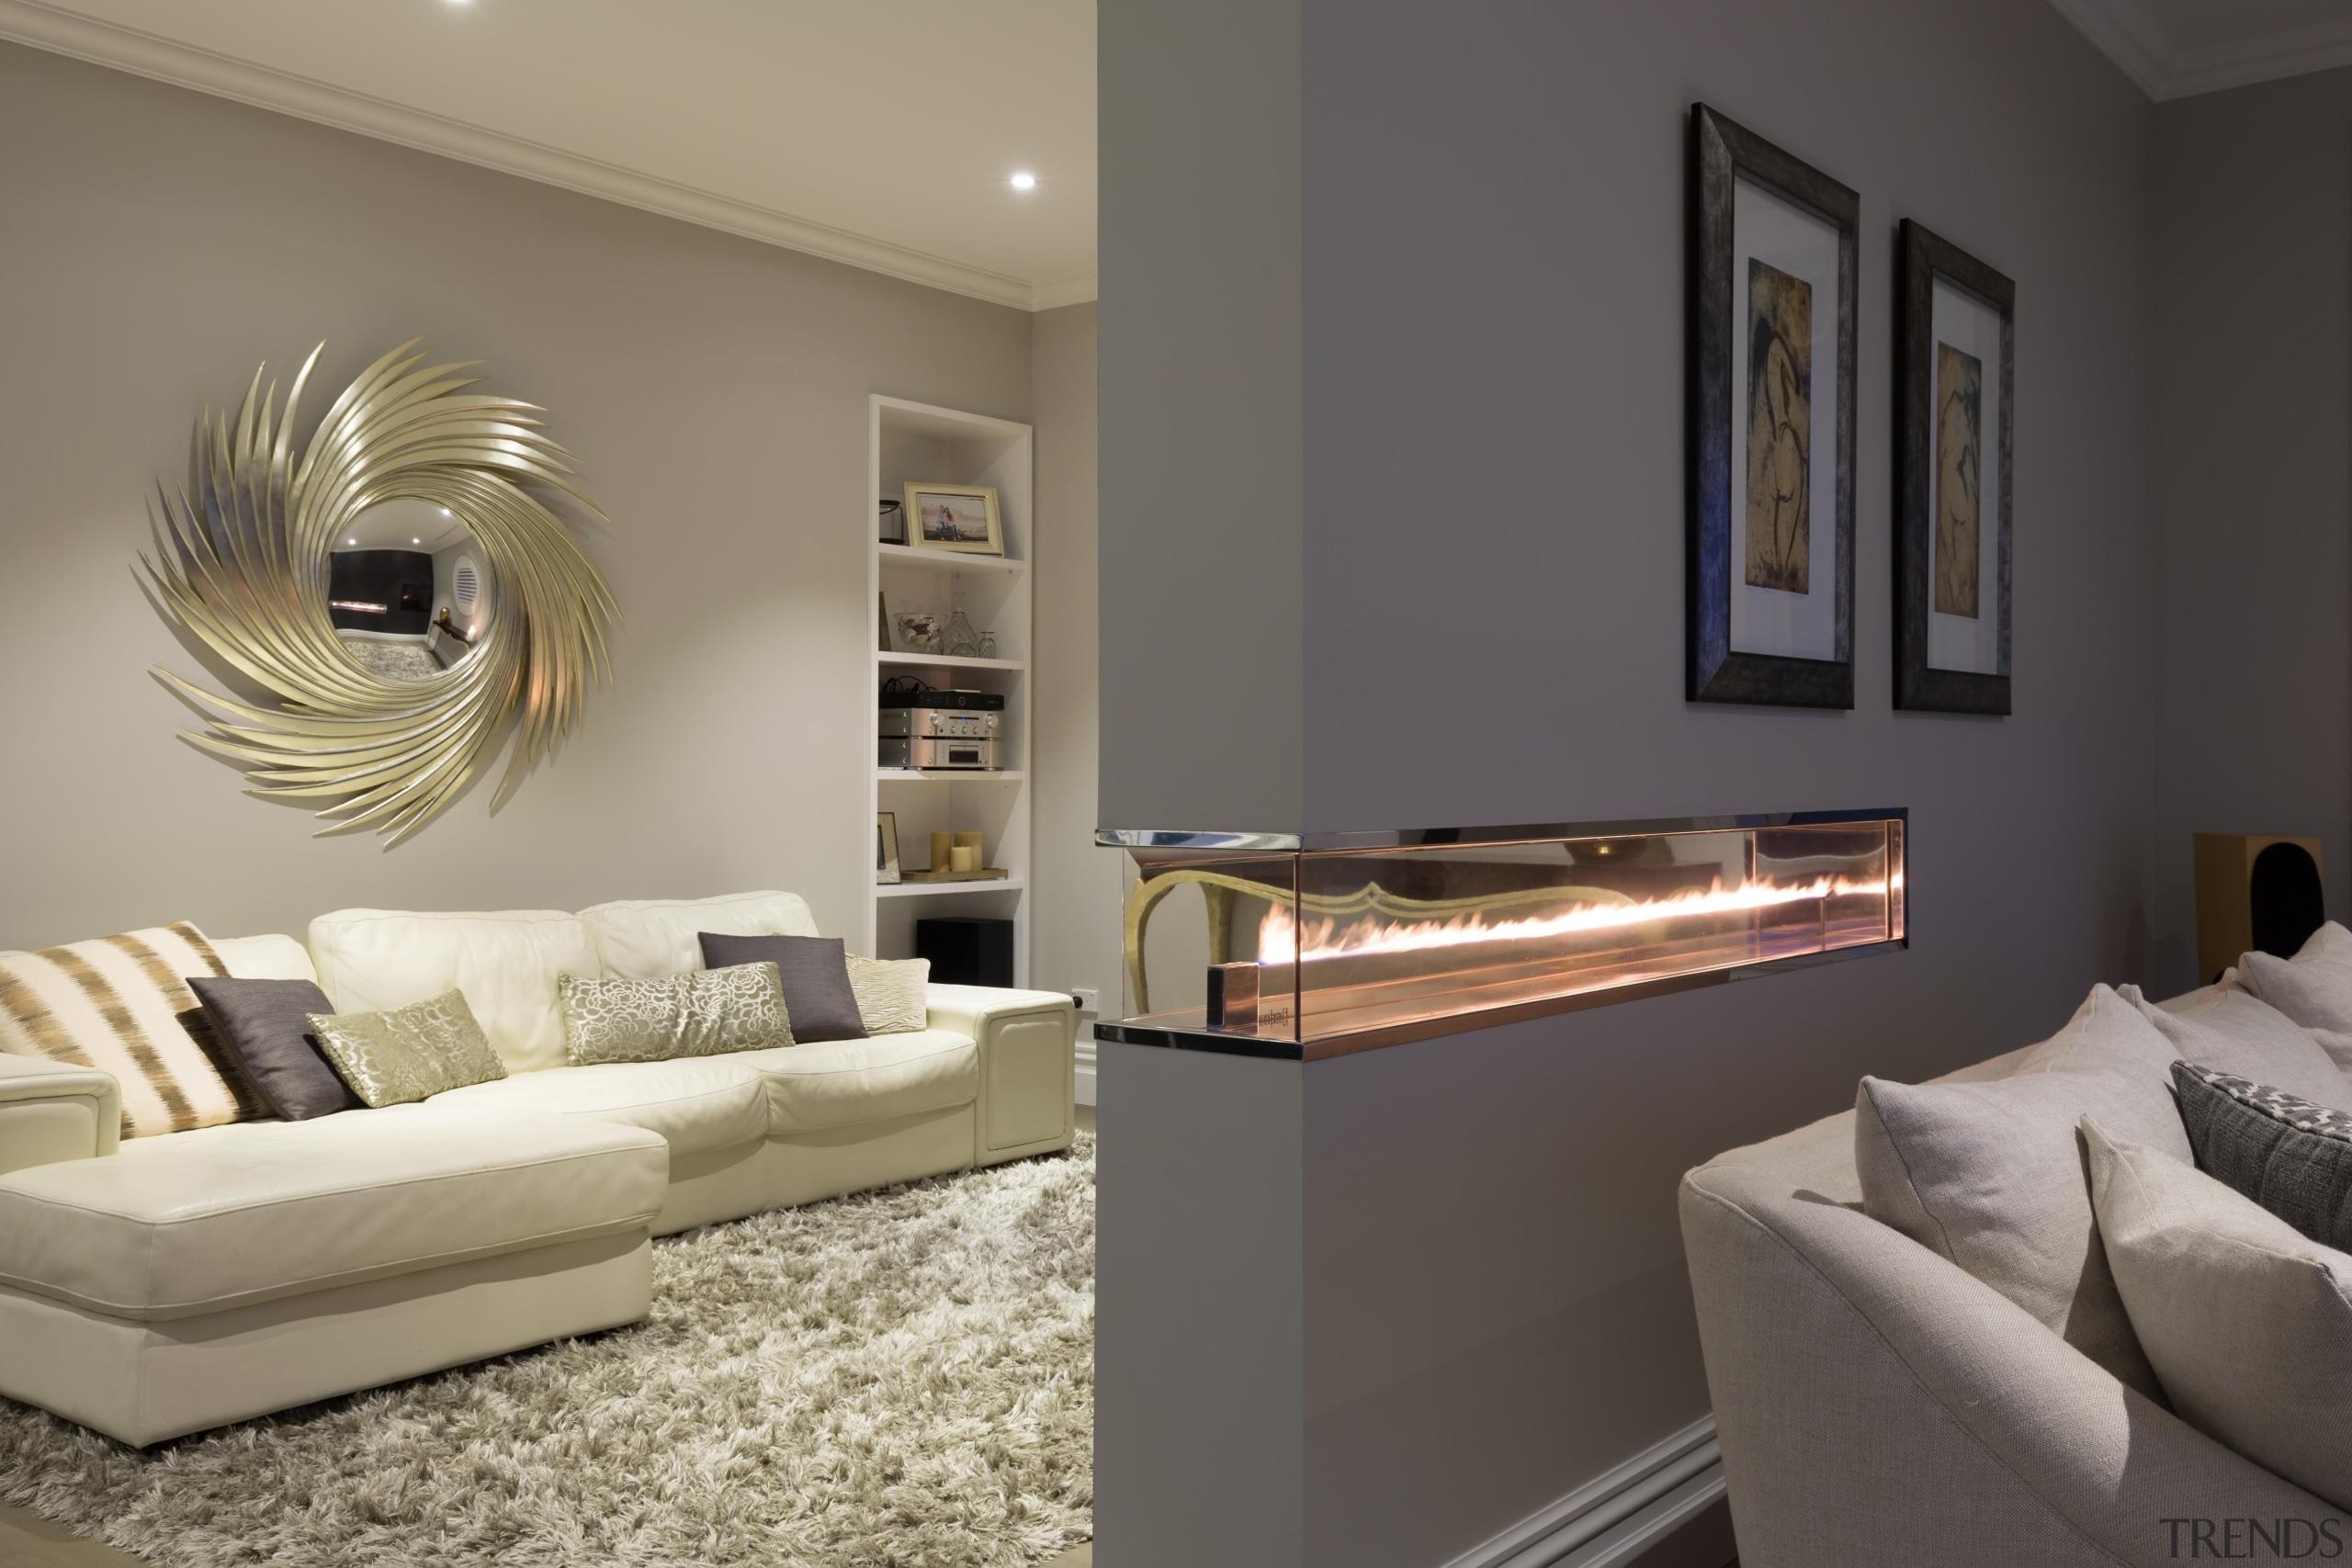 Img9010 - ceiling | floor | furniture | ceiling, floor, furniture, home, interior design, living room, room, wall, gray